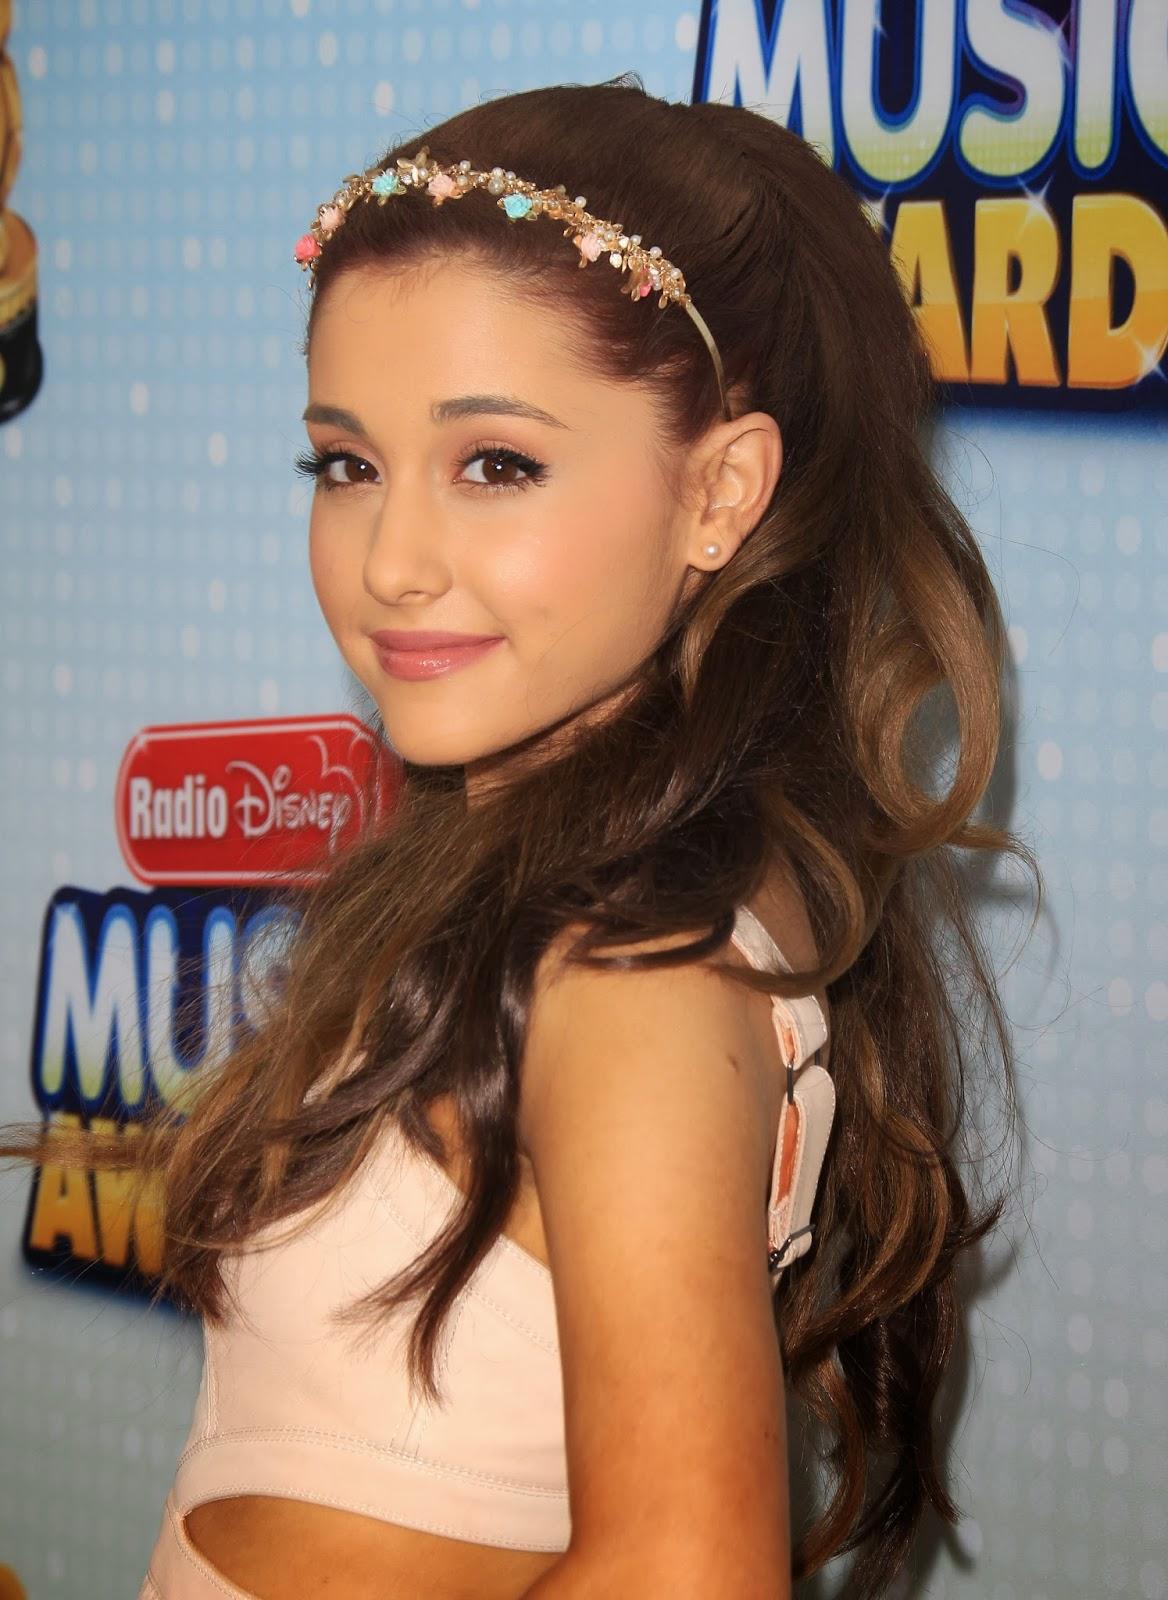 Ariana Grande Trend Fashion 2013 Celebrity Magazine